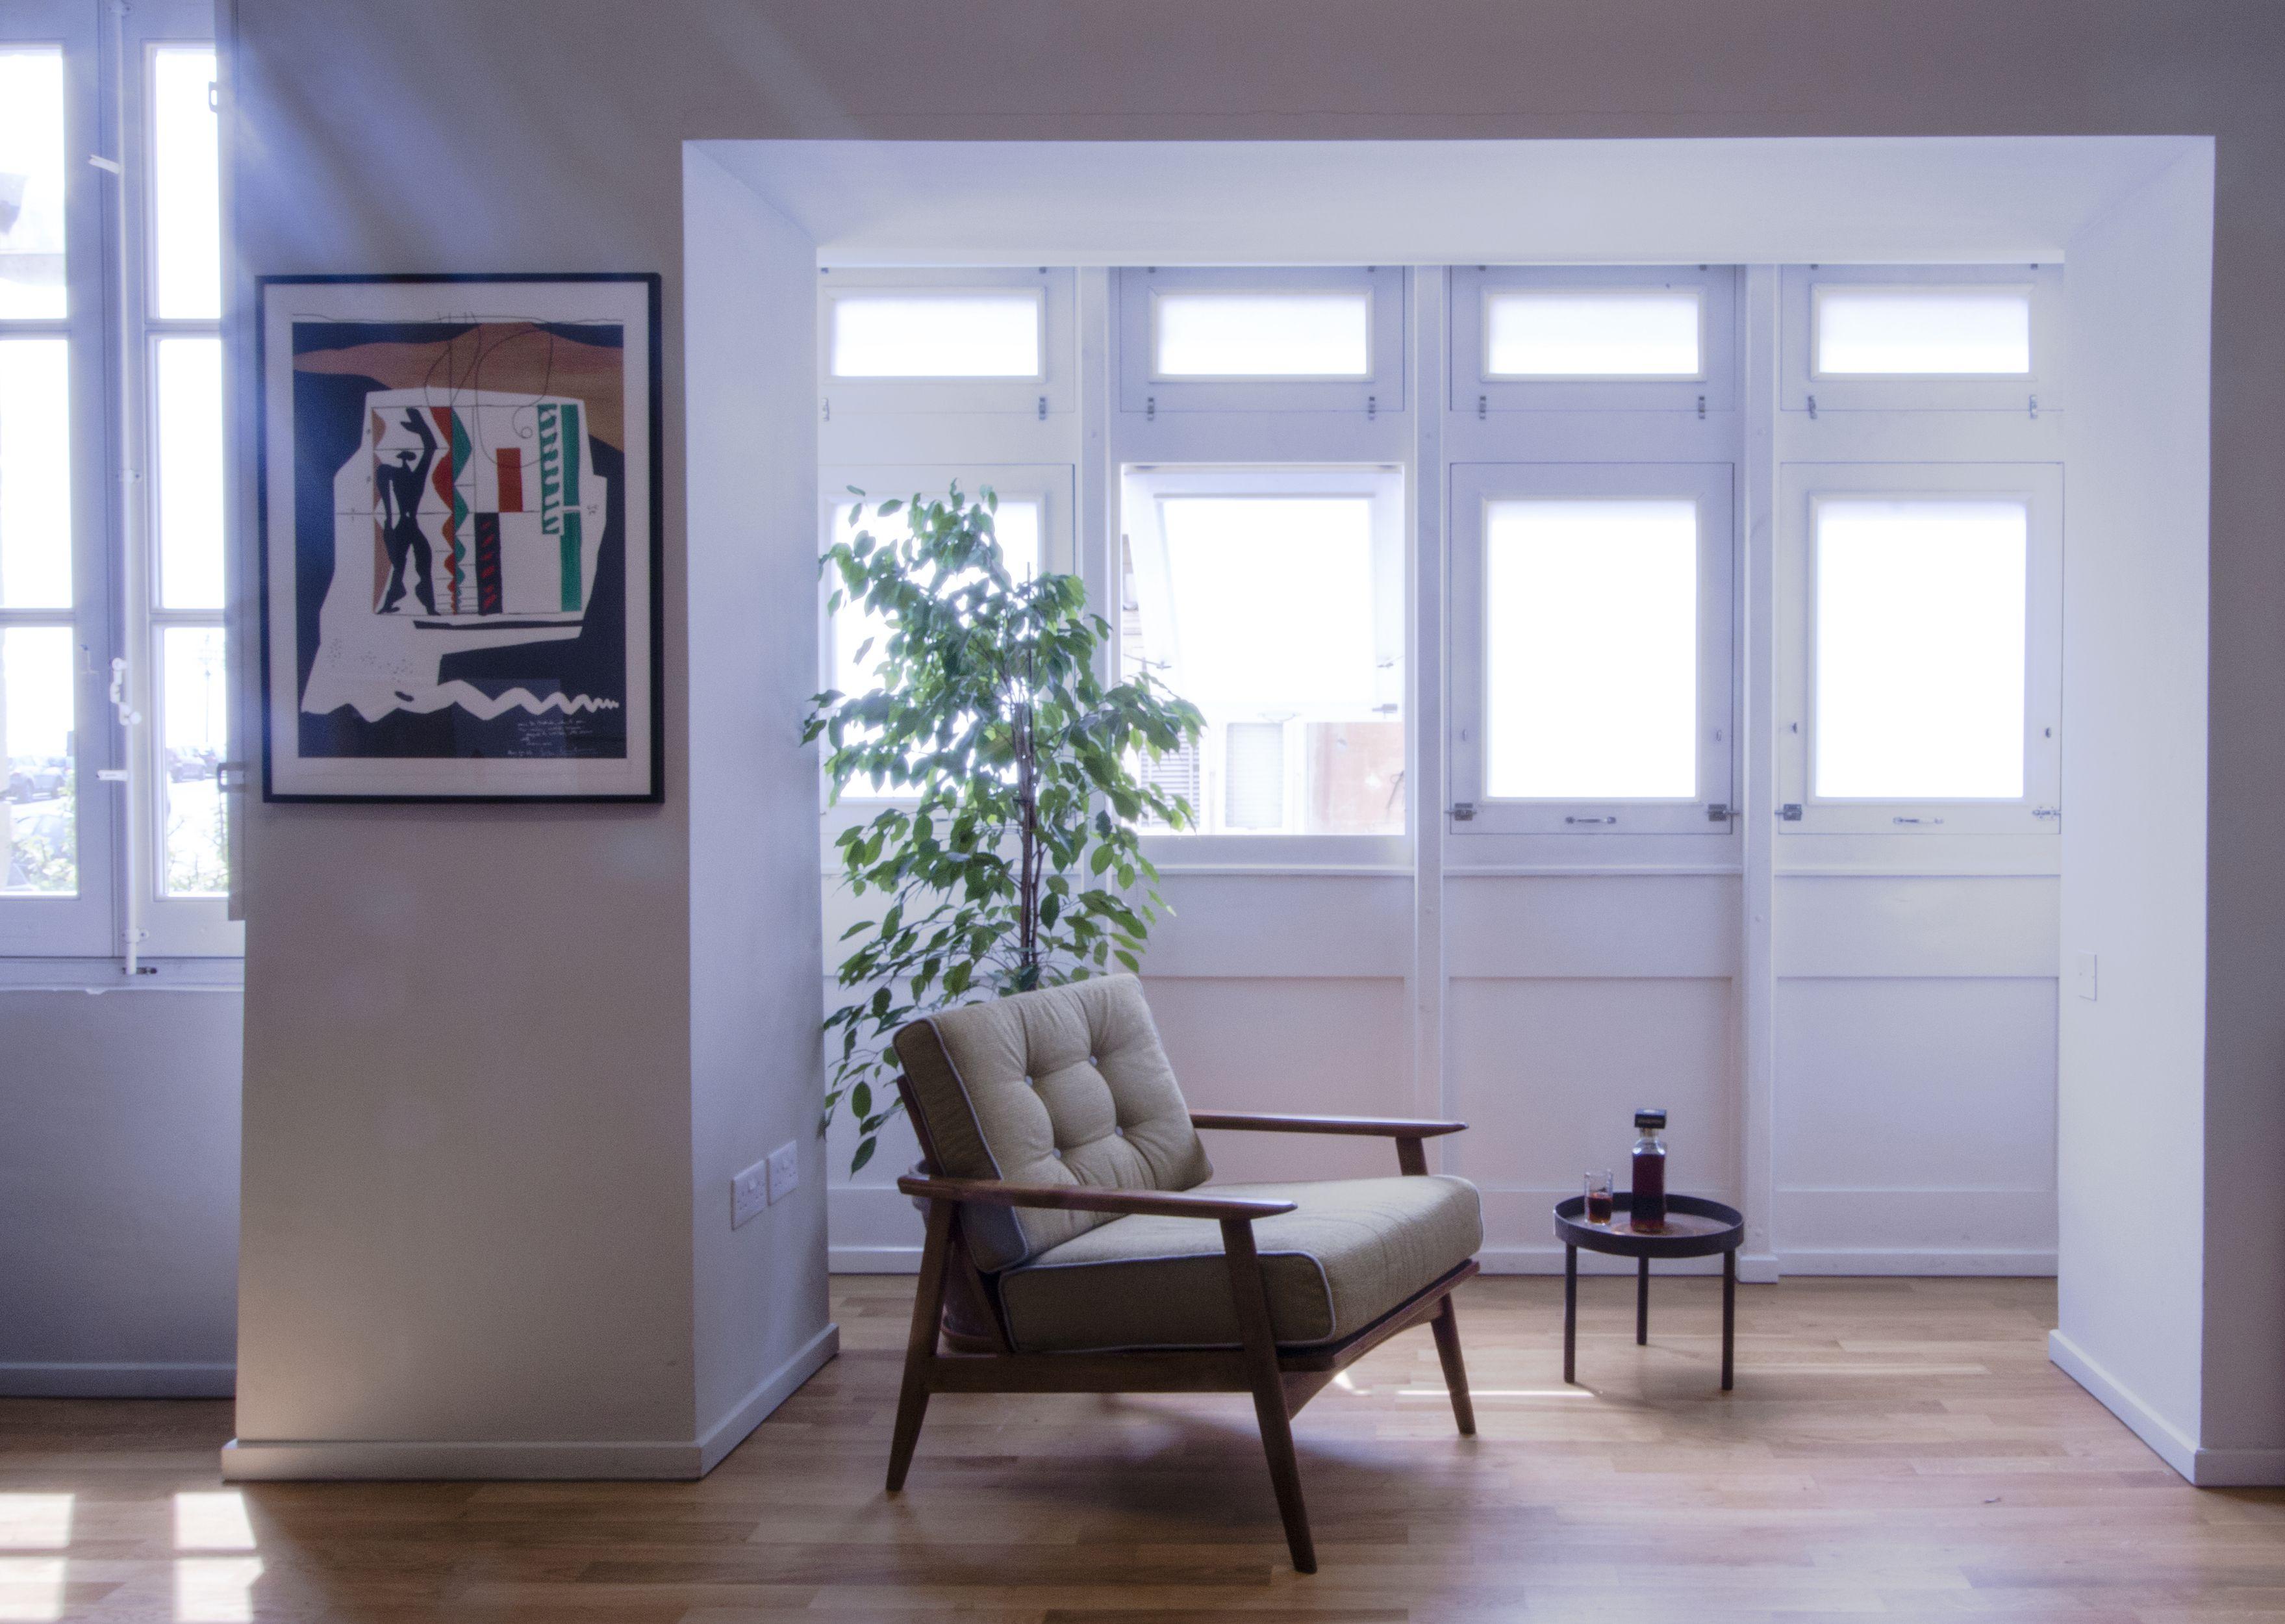 Explore Vintage Interior Design And More